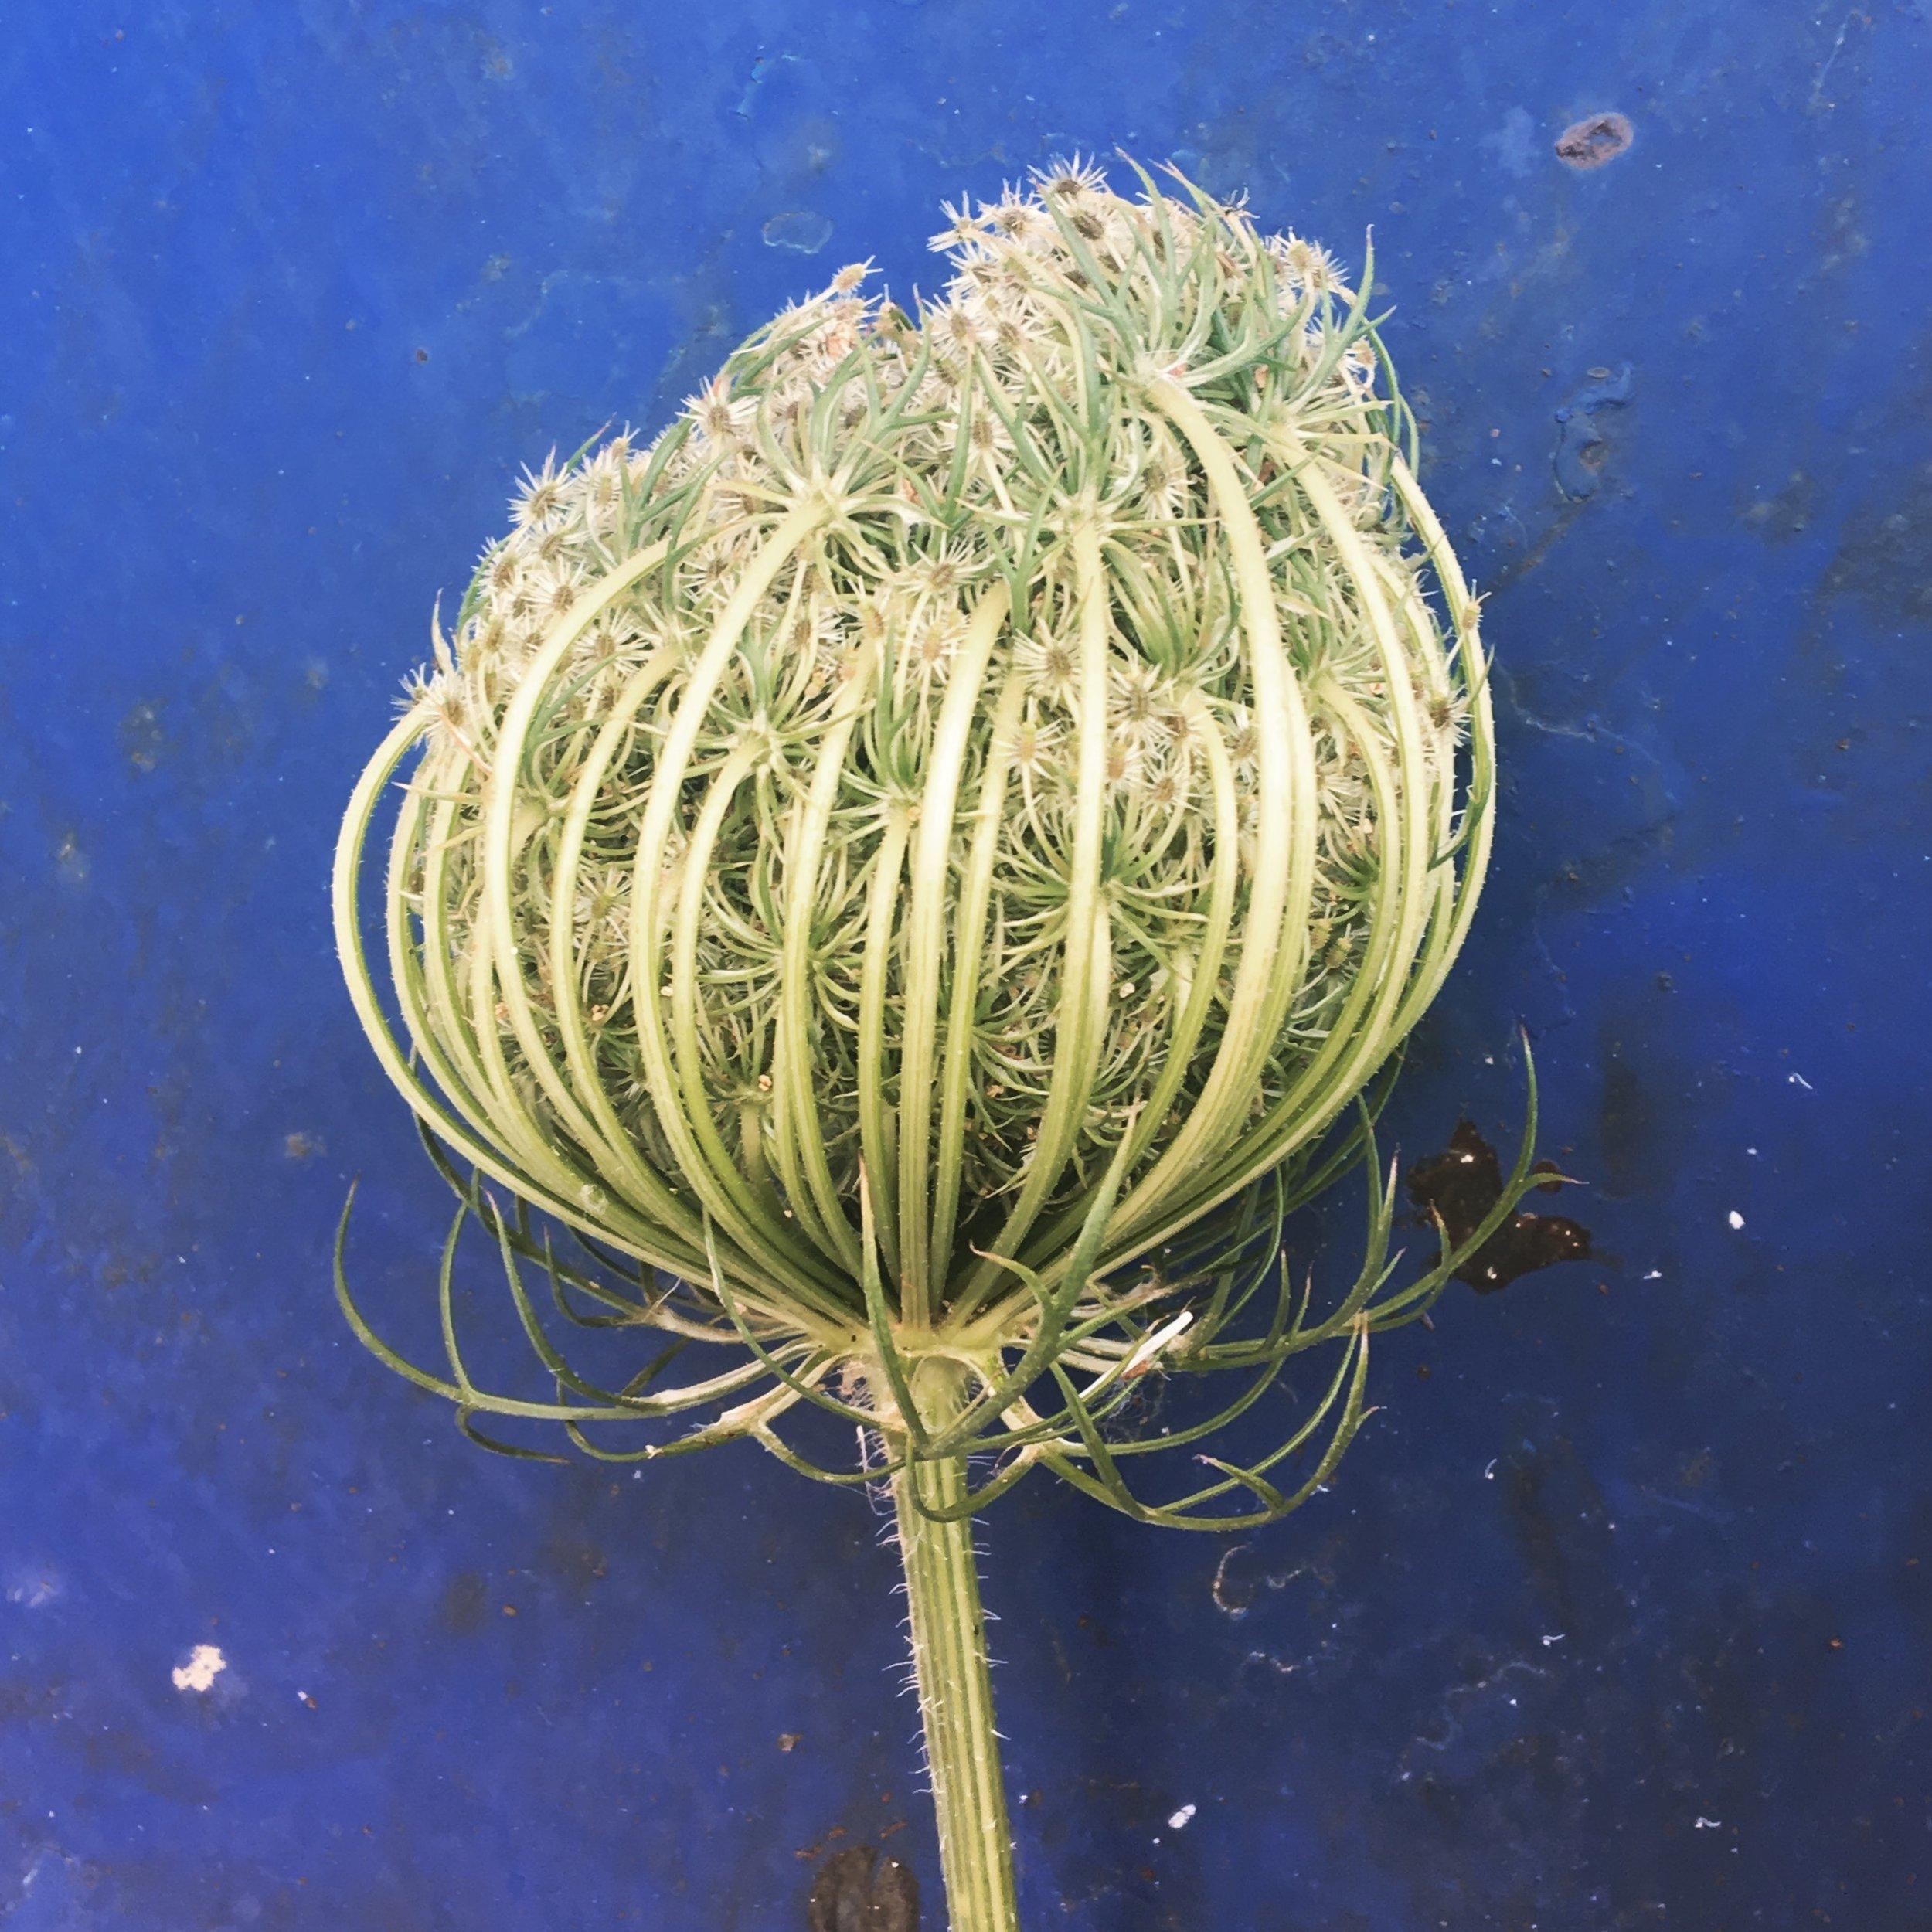 Seedhead on blue background